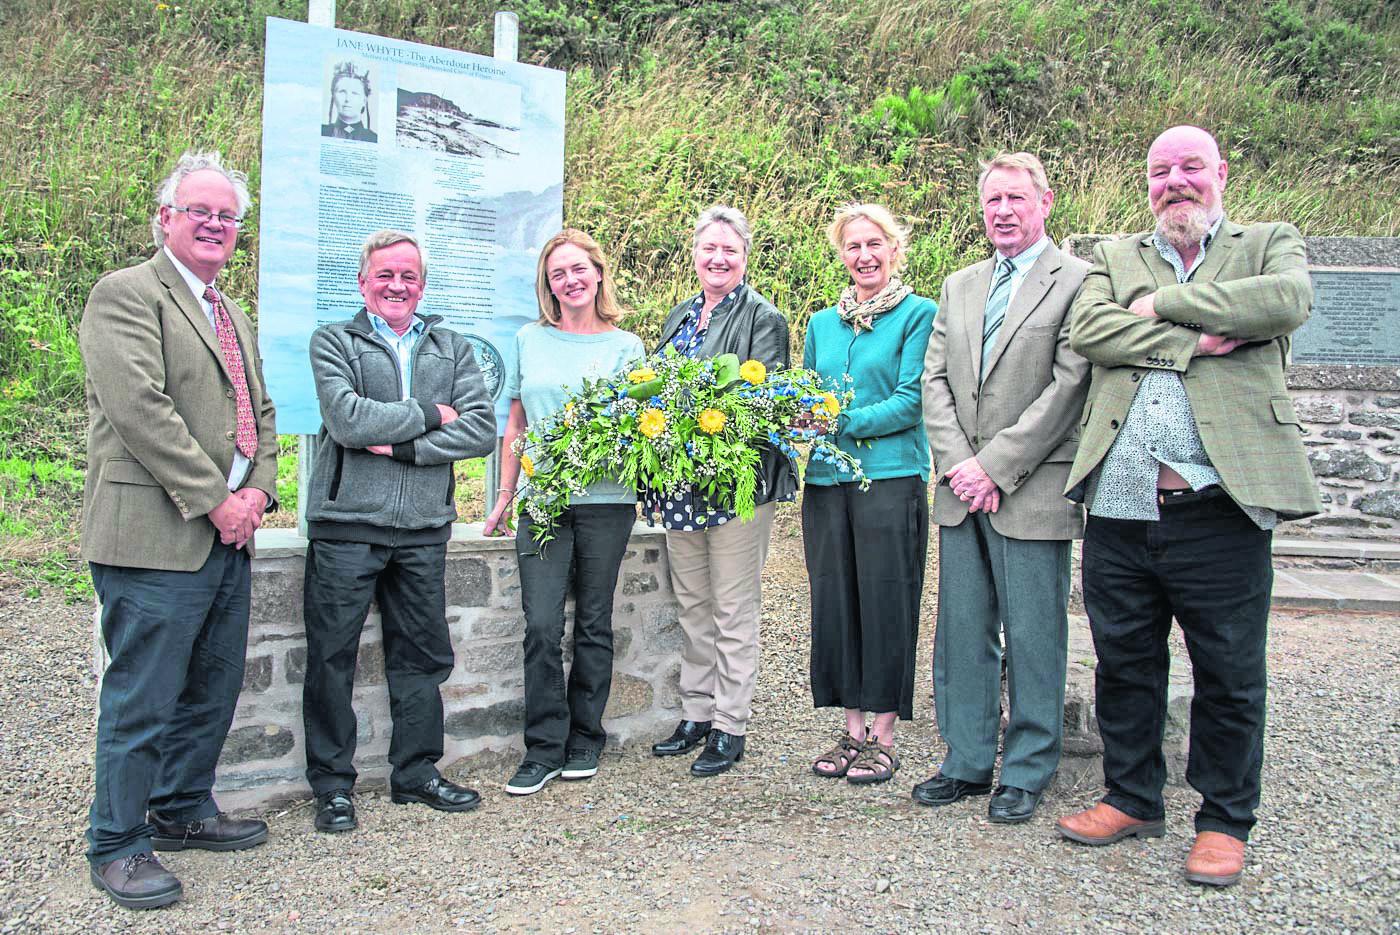 Bill Pitt, Wilson Irvine, Wendy Andrews, Miriam Kemp, Leanda Denton, Gordon Duguid, Robbie Kelman alongside the new information board.